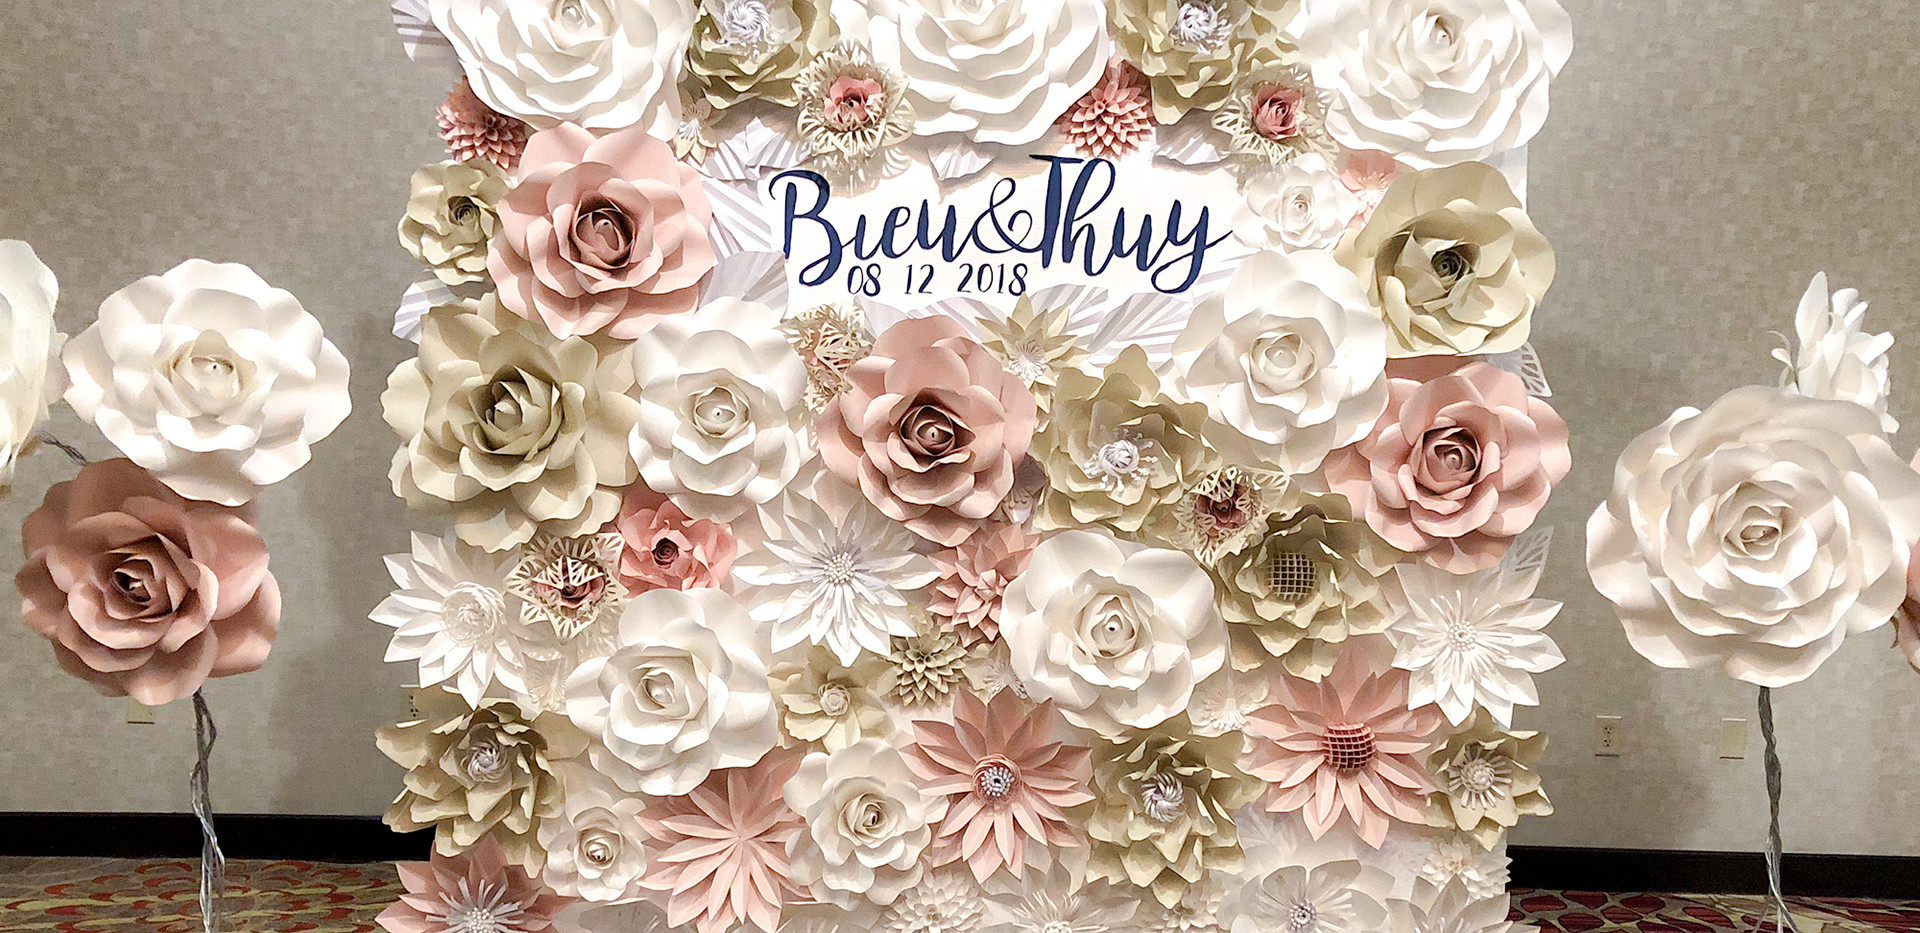 Blush, creams and whites